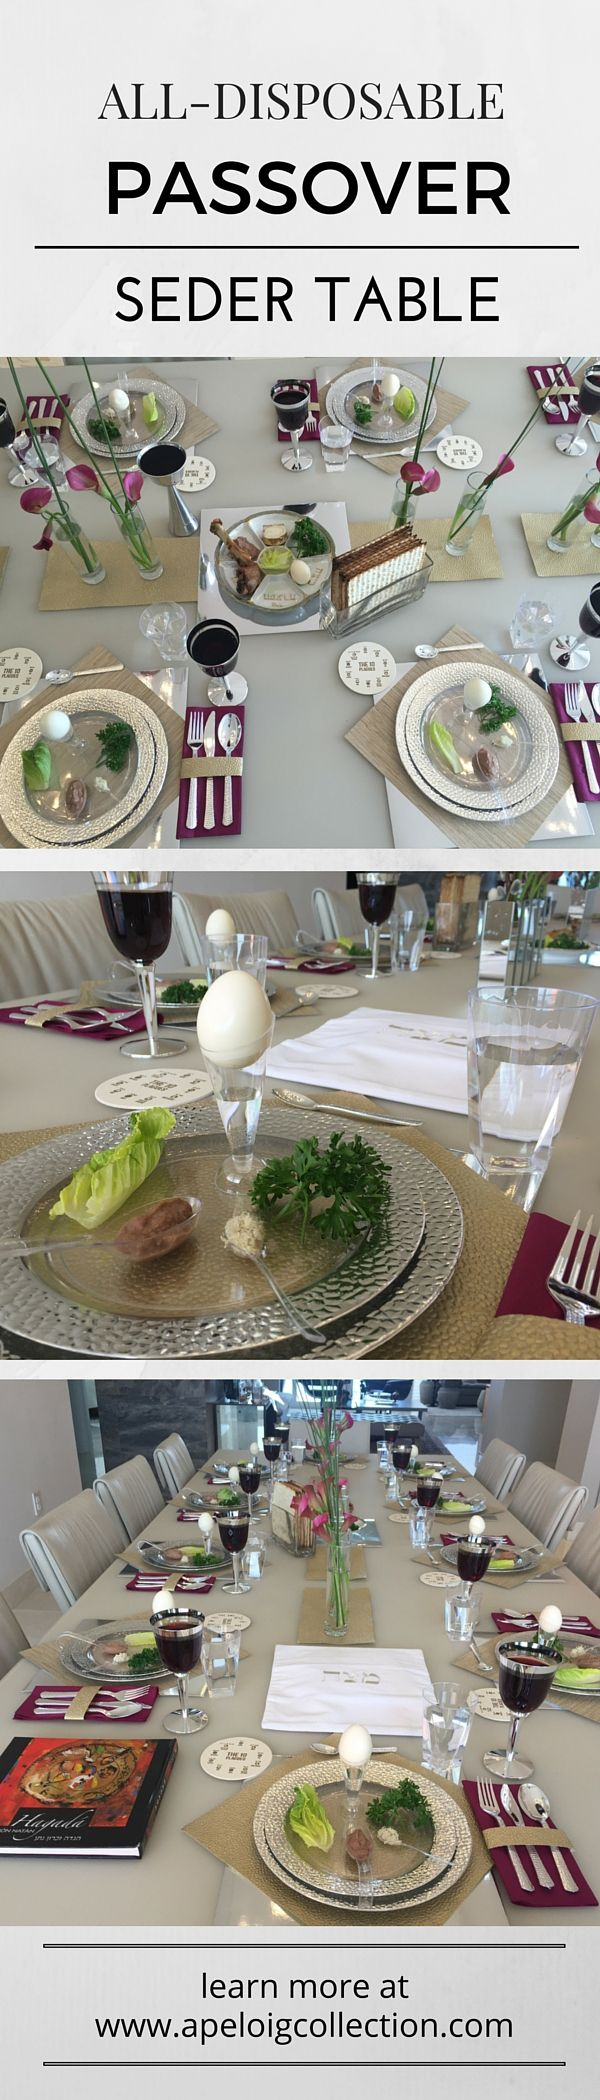 Make a Passover seder ALL disposable & Make a Passover seder ALL disposable   Elegant Create and Passover ...